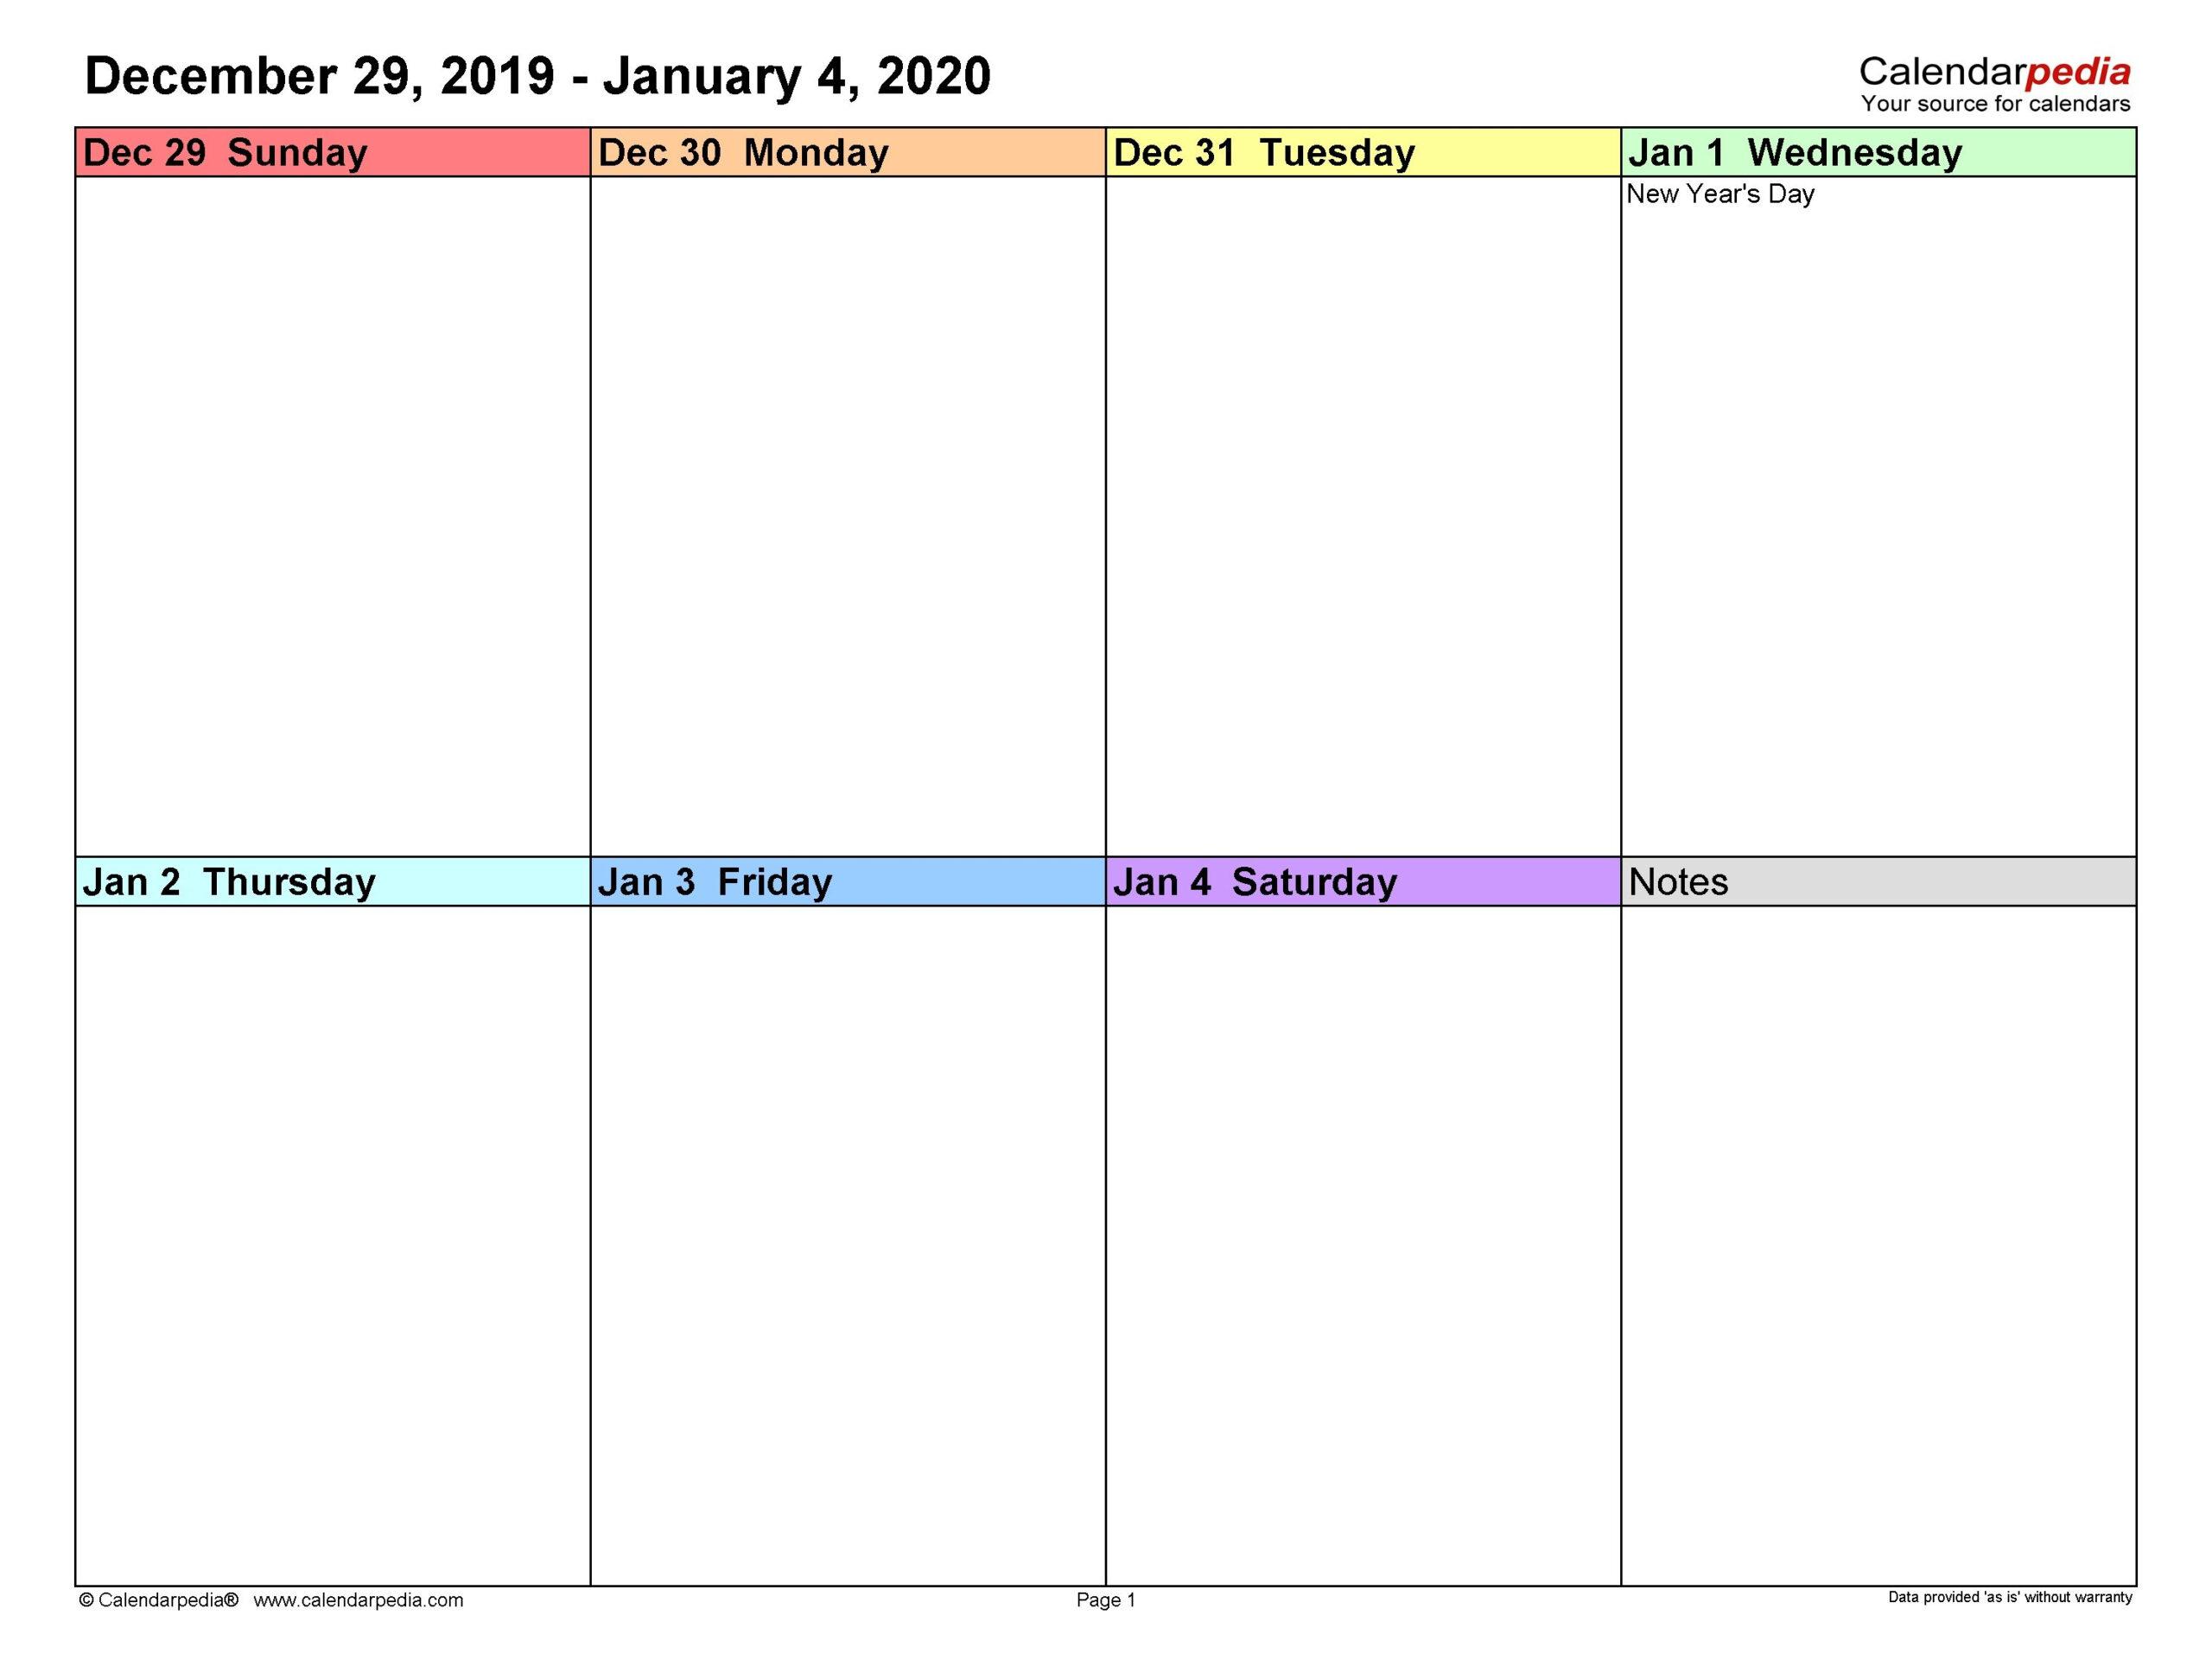 Universal Blank 2 Week Calendar In 2020 | Free Calendar